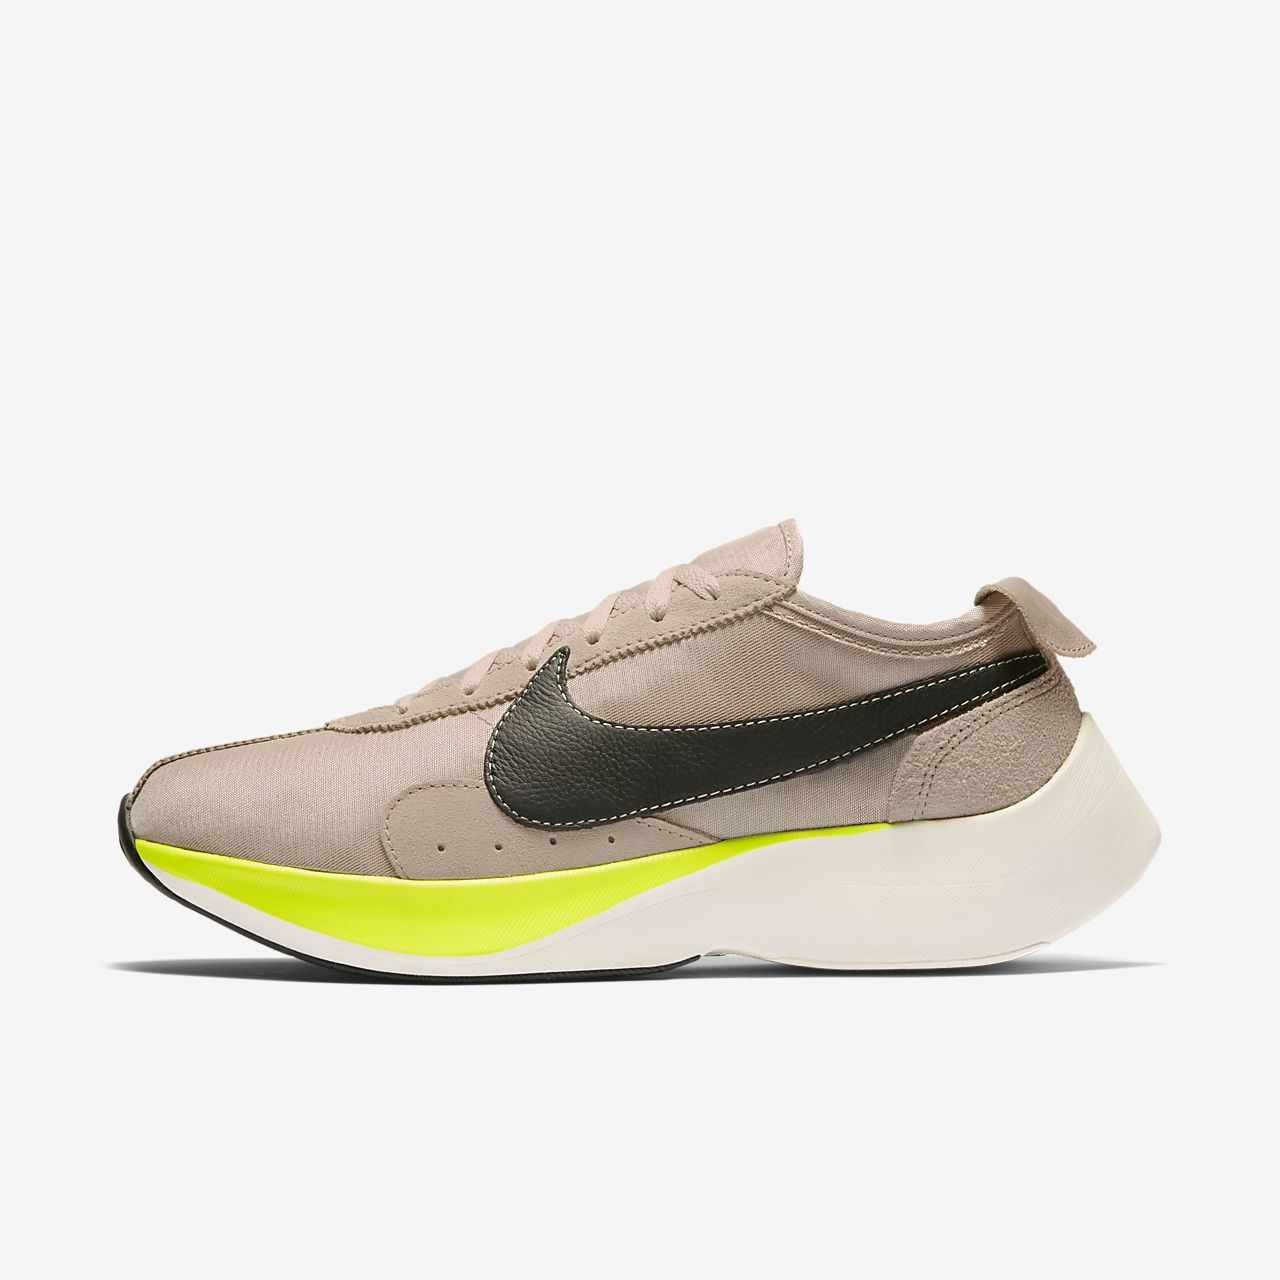 Nike Moon Racer Men's Shoe